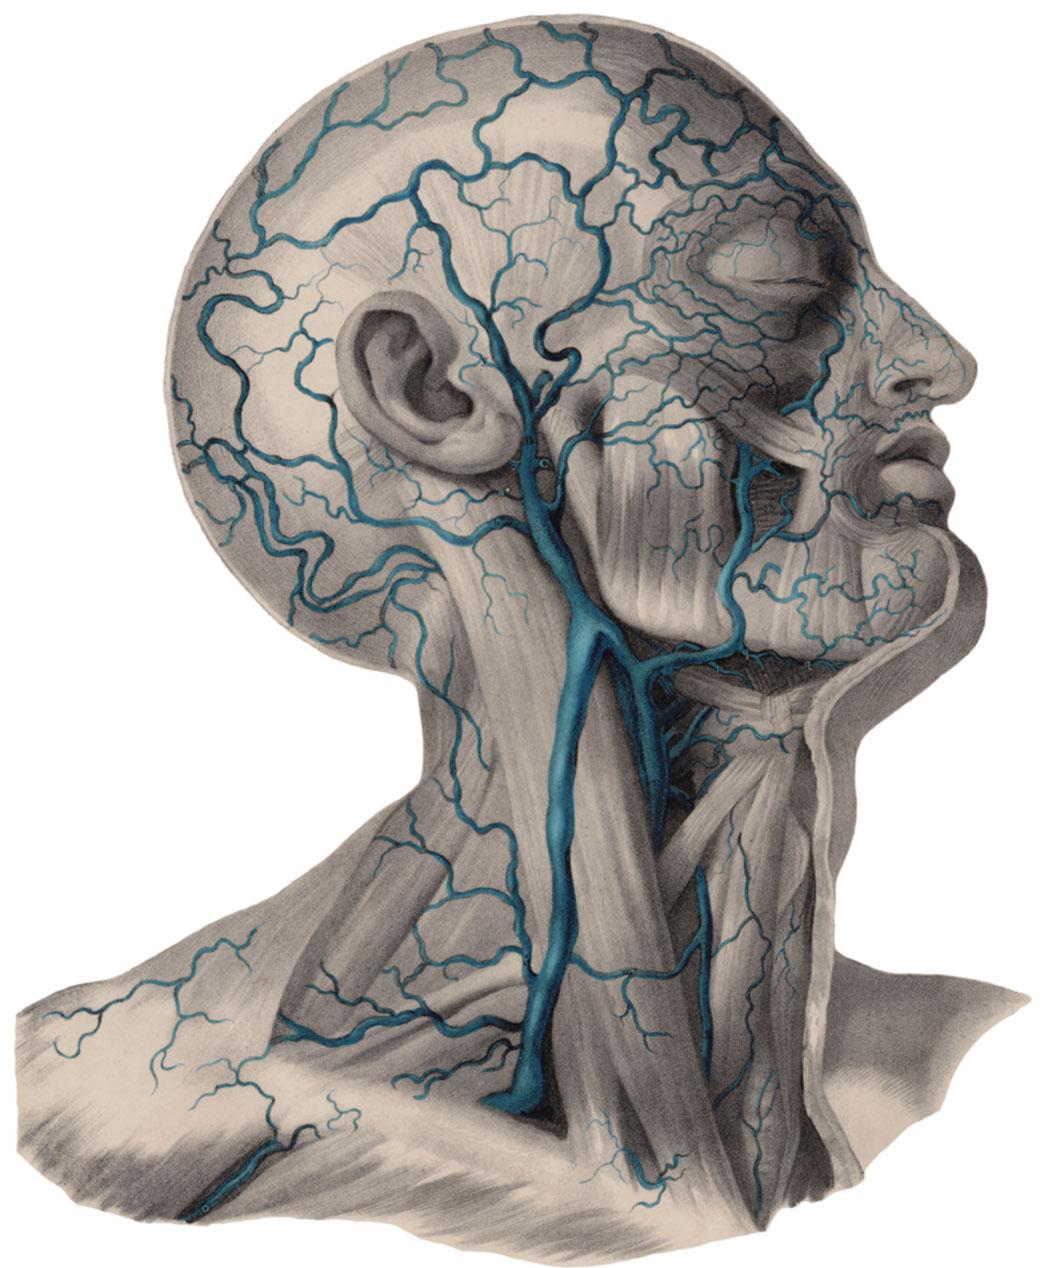 how deep is the jugular vein